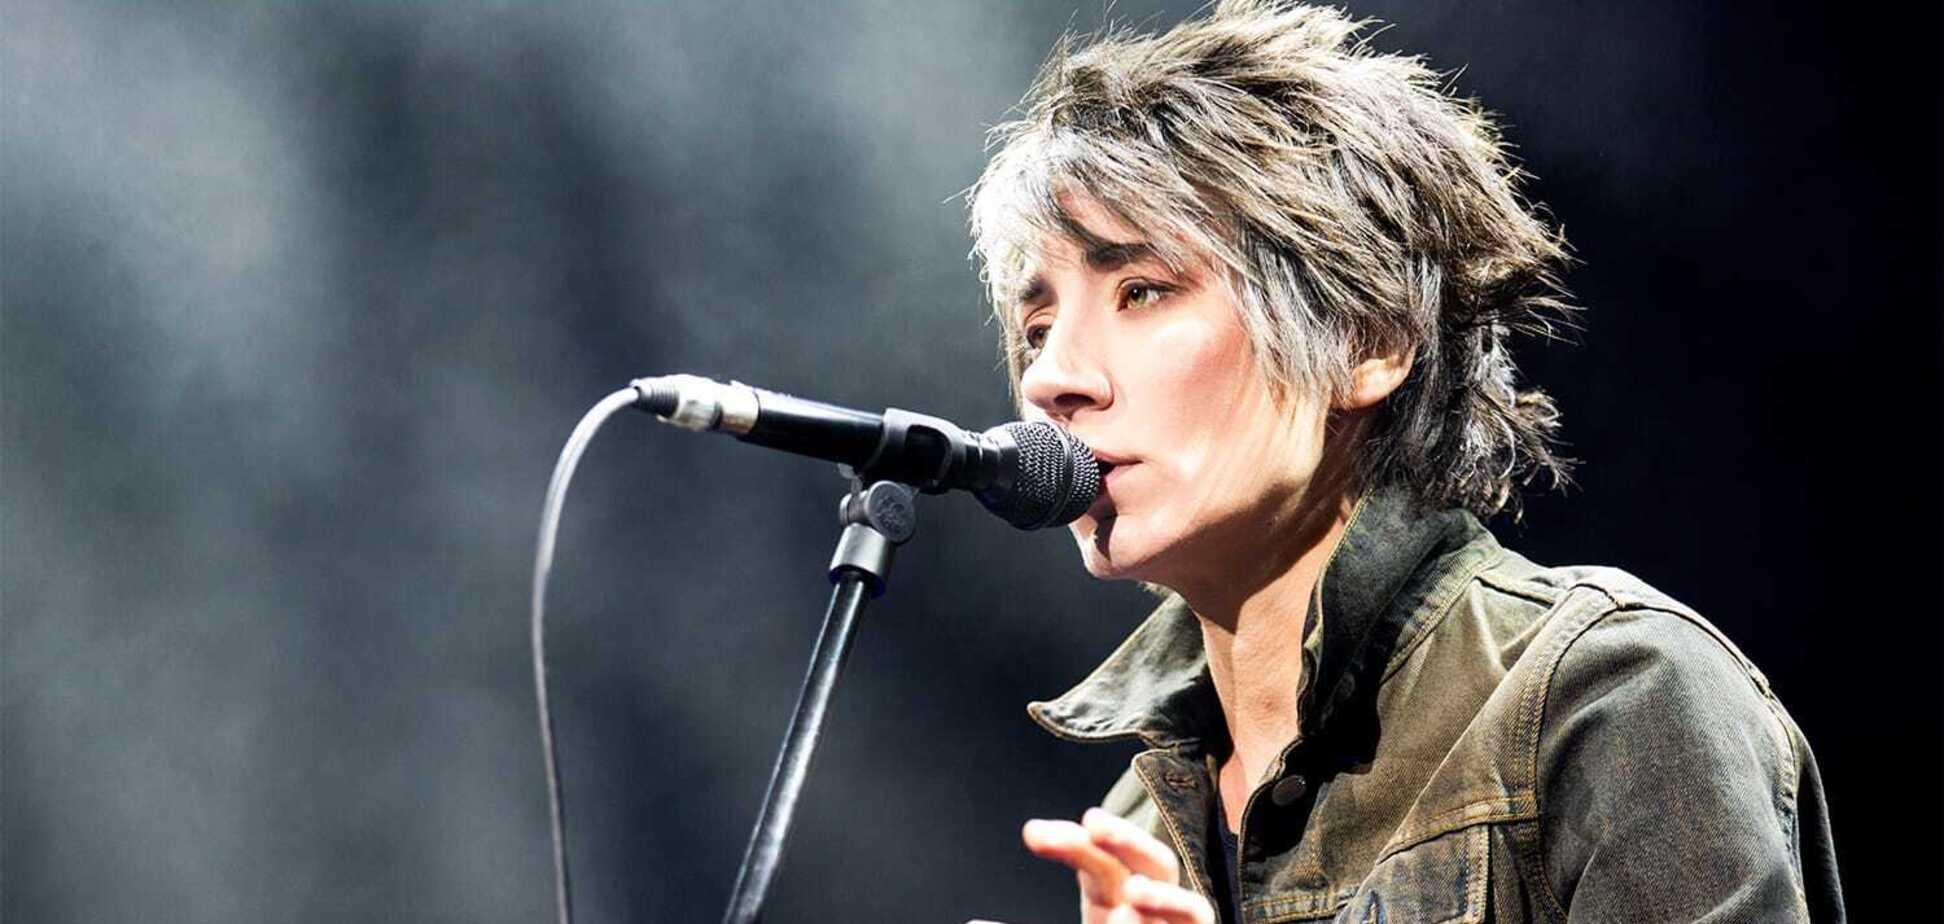 На концерте рок-певицы Земфиры умер мужчина